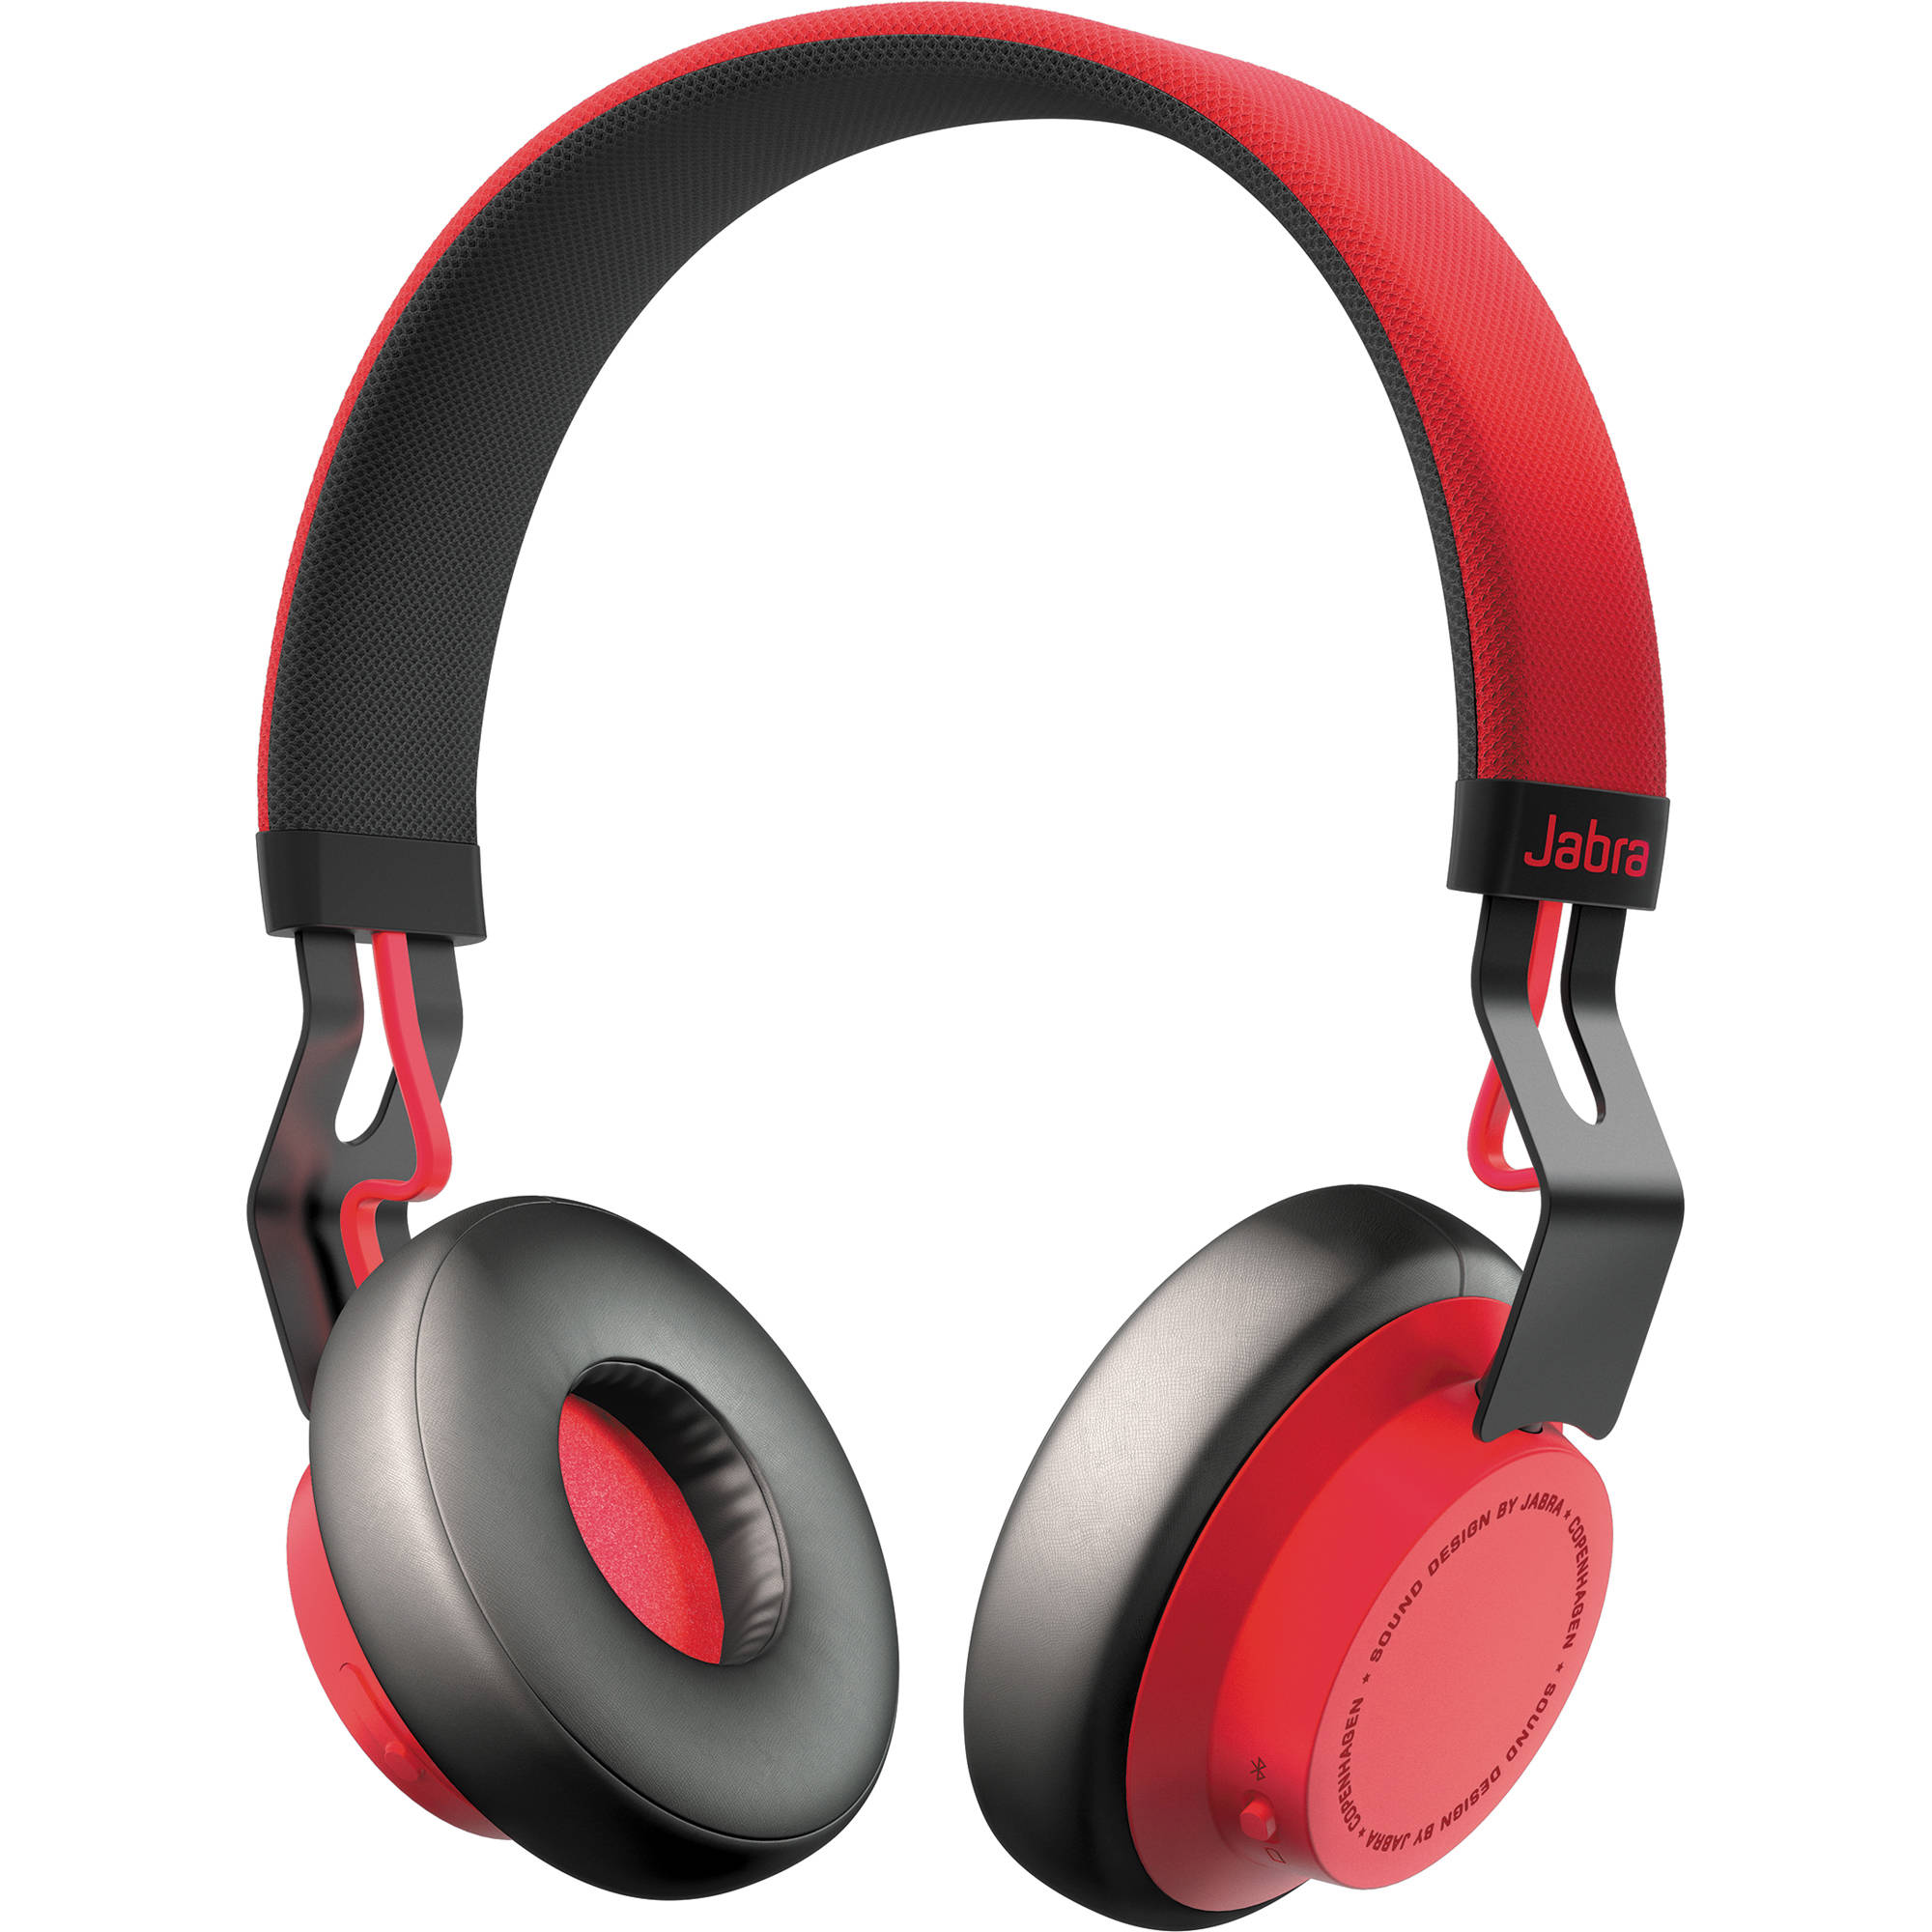 Ireless Bluetooth Headphones Red Subaru Coffee Sony Mdr Xb650btr Jabra Move Wireless